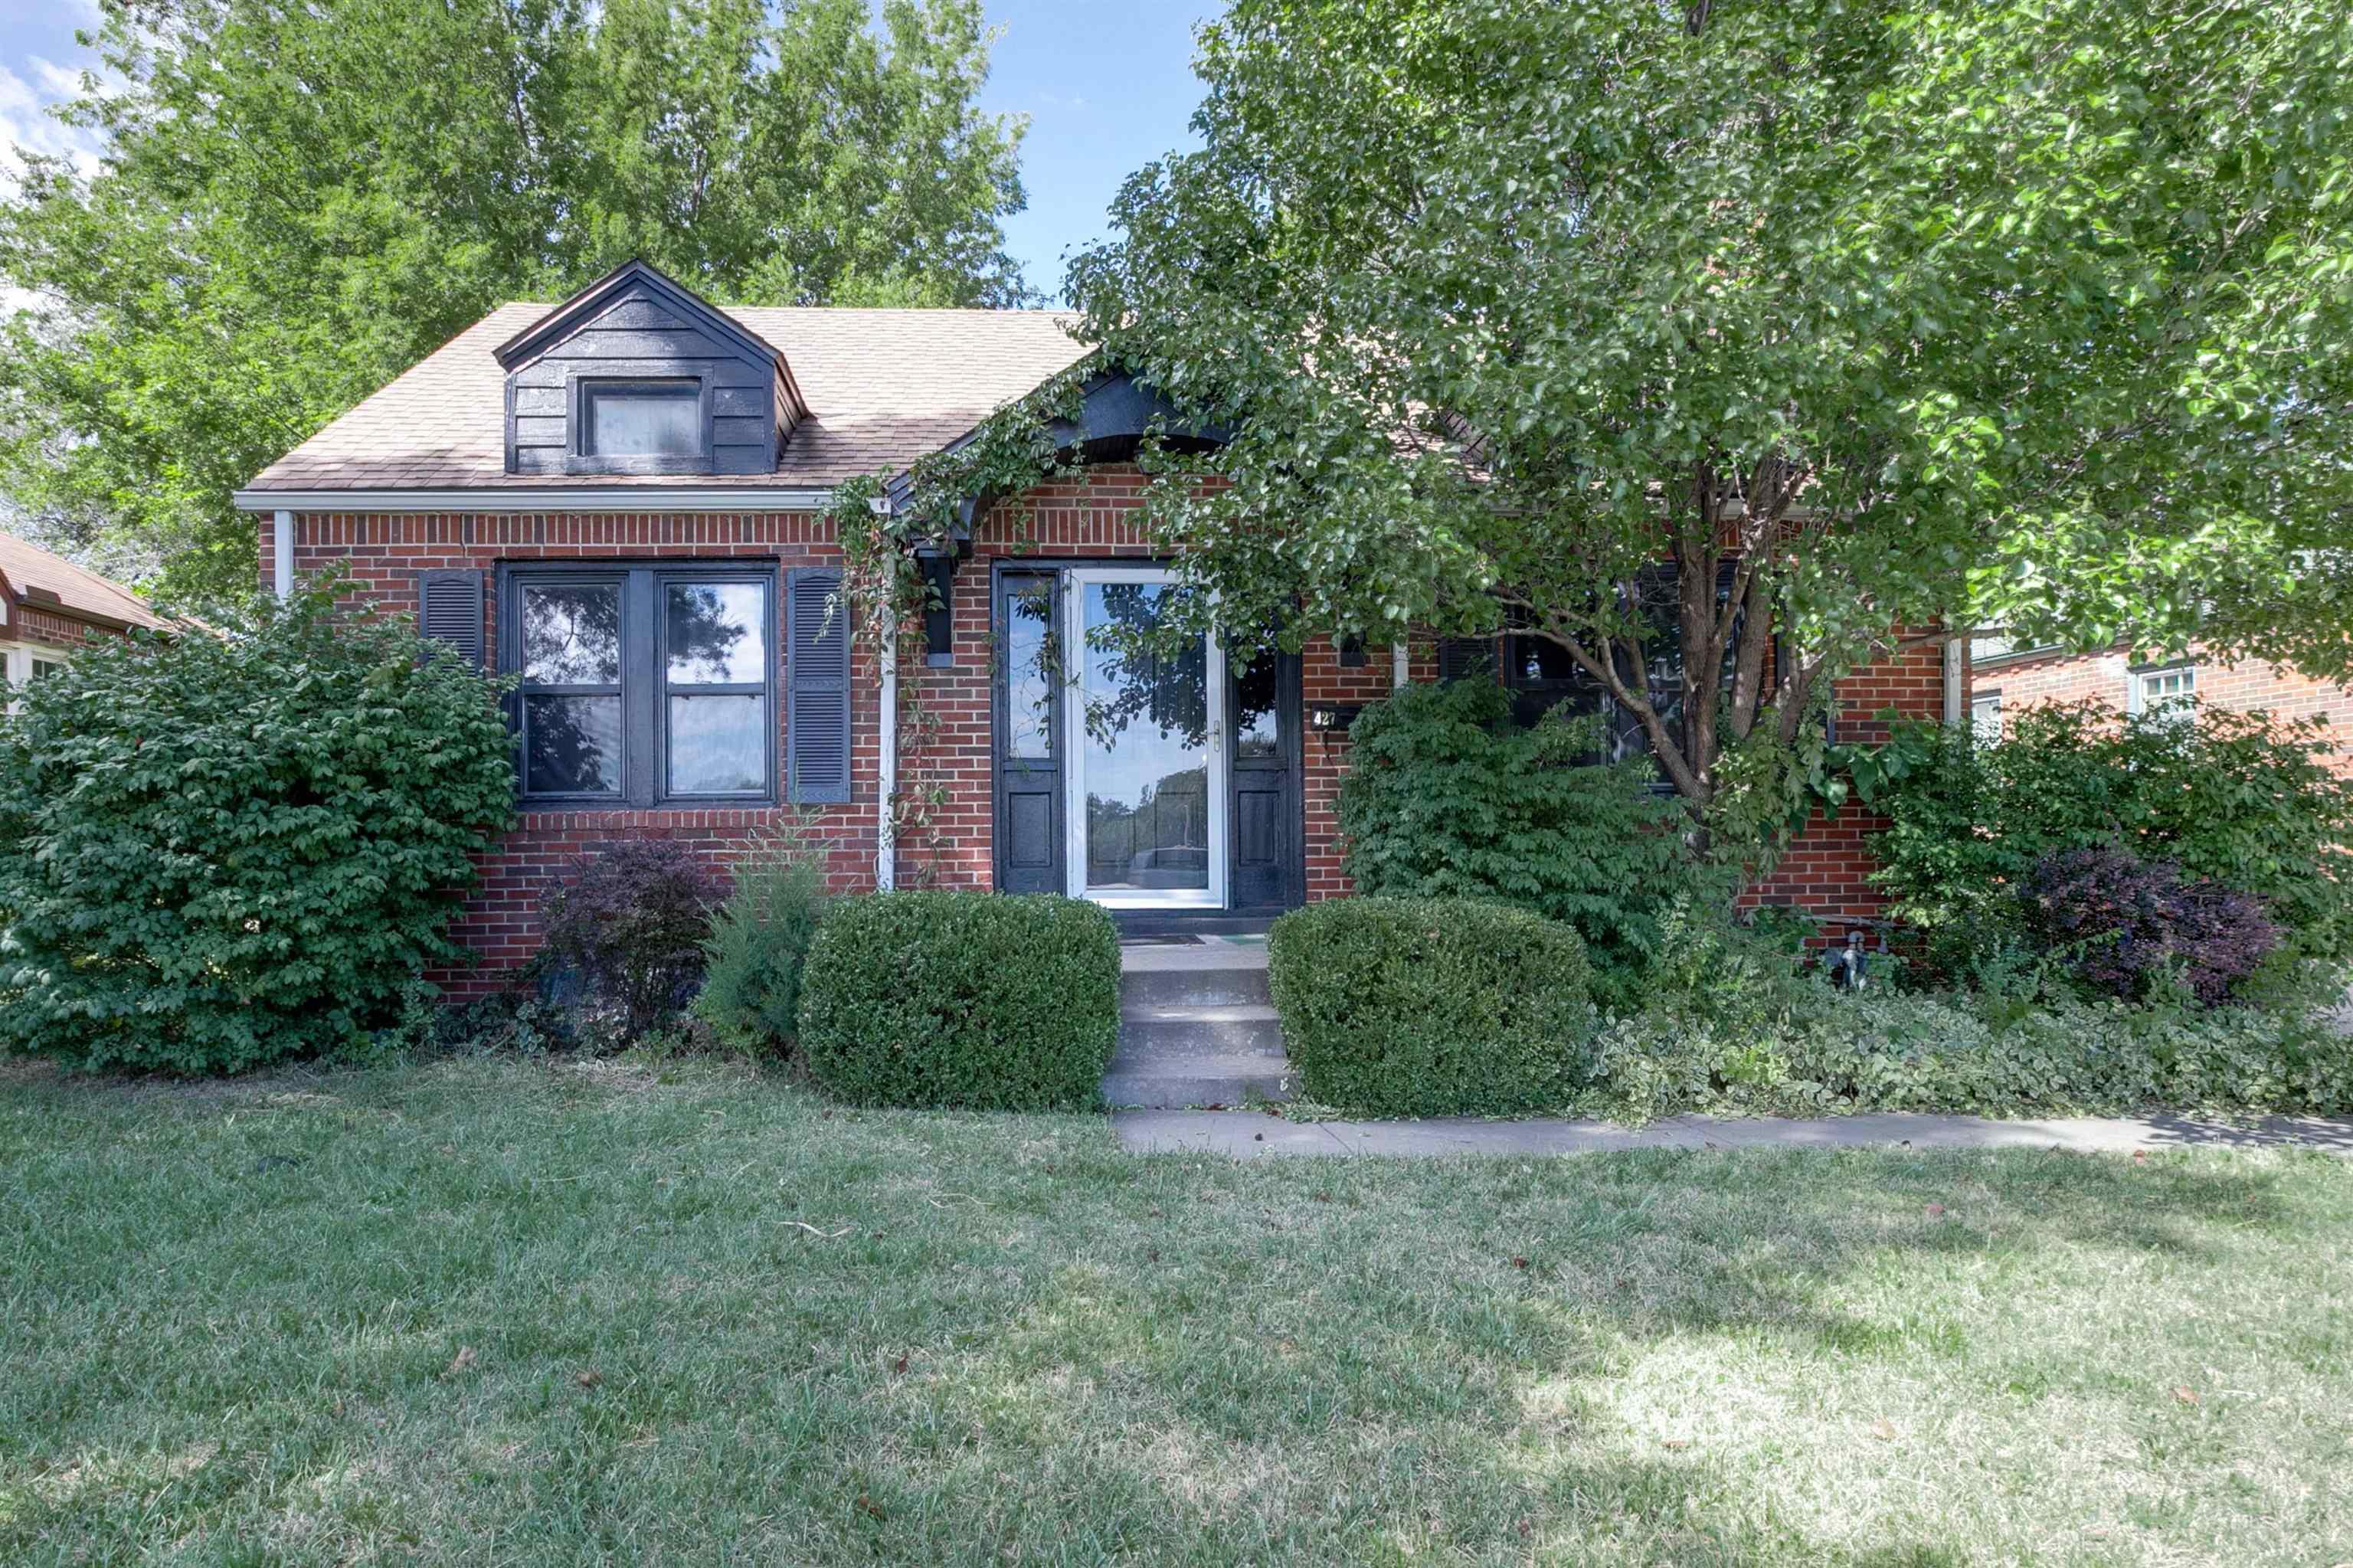 427 N Oliver Ave, Wichita, KS, 67208